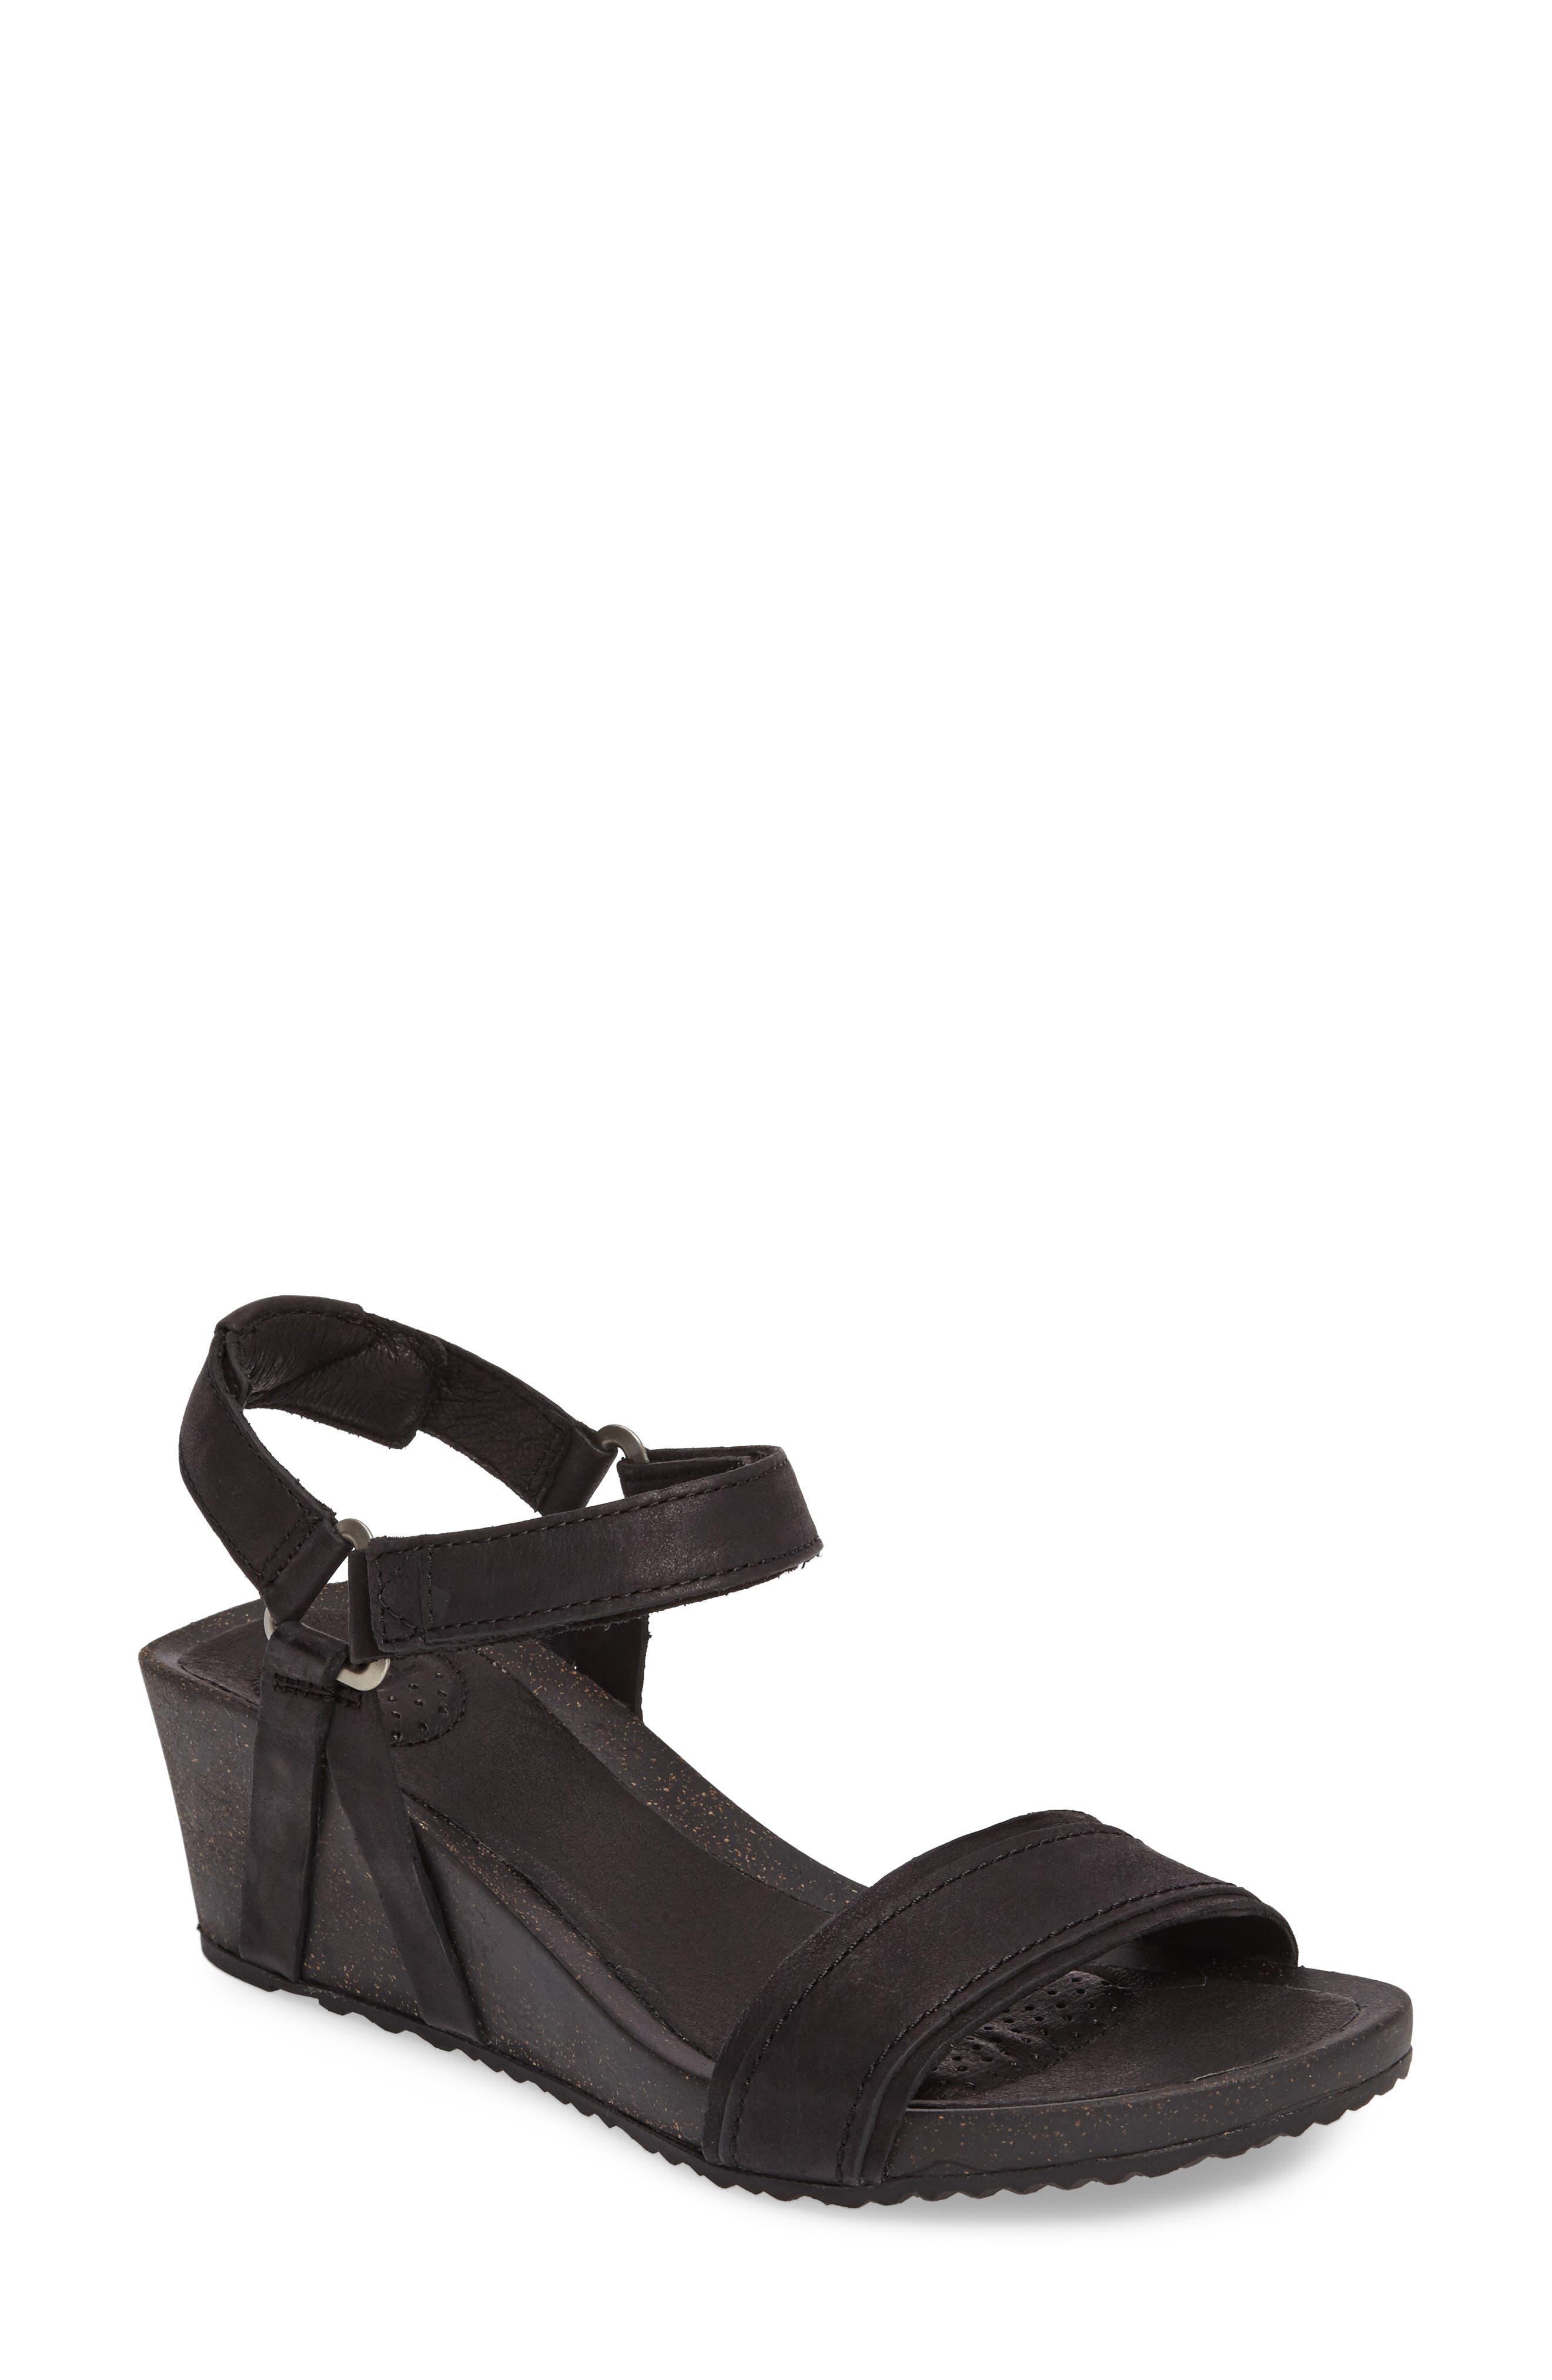 Ysidro Stitch Wedge Sandal,                         Main,                         color, Black Leather